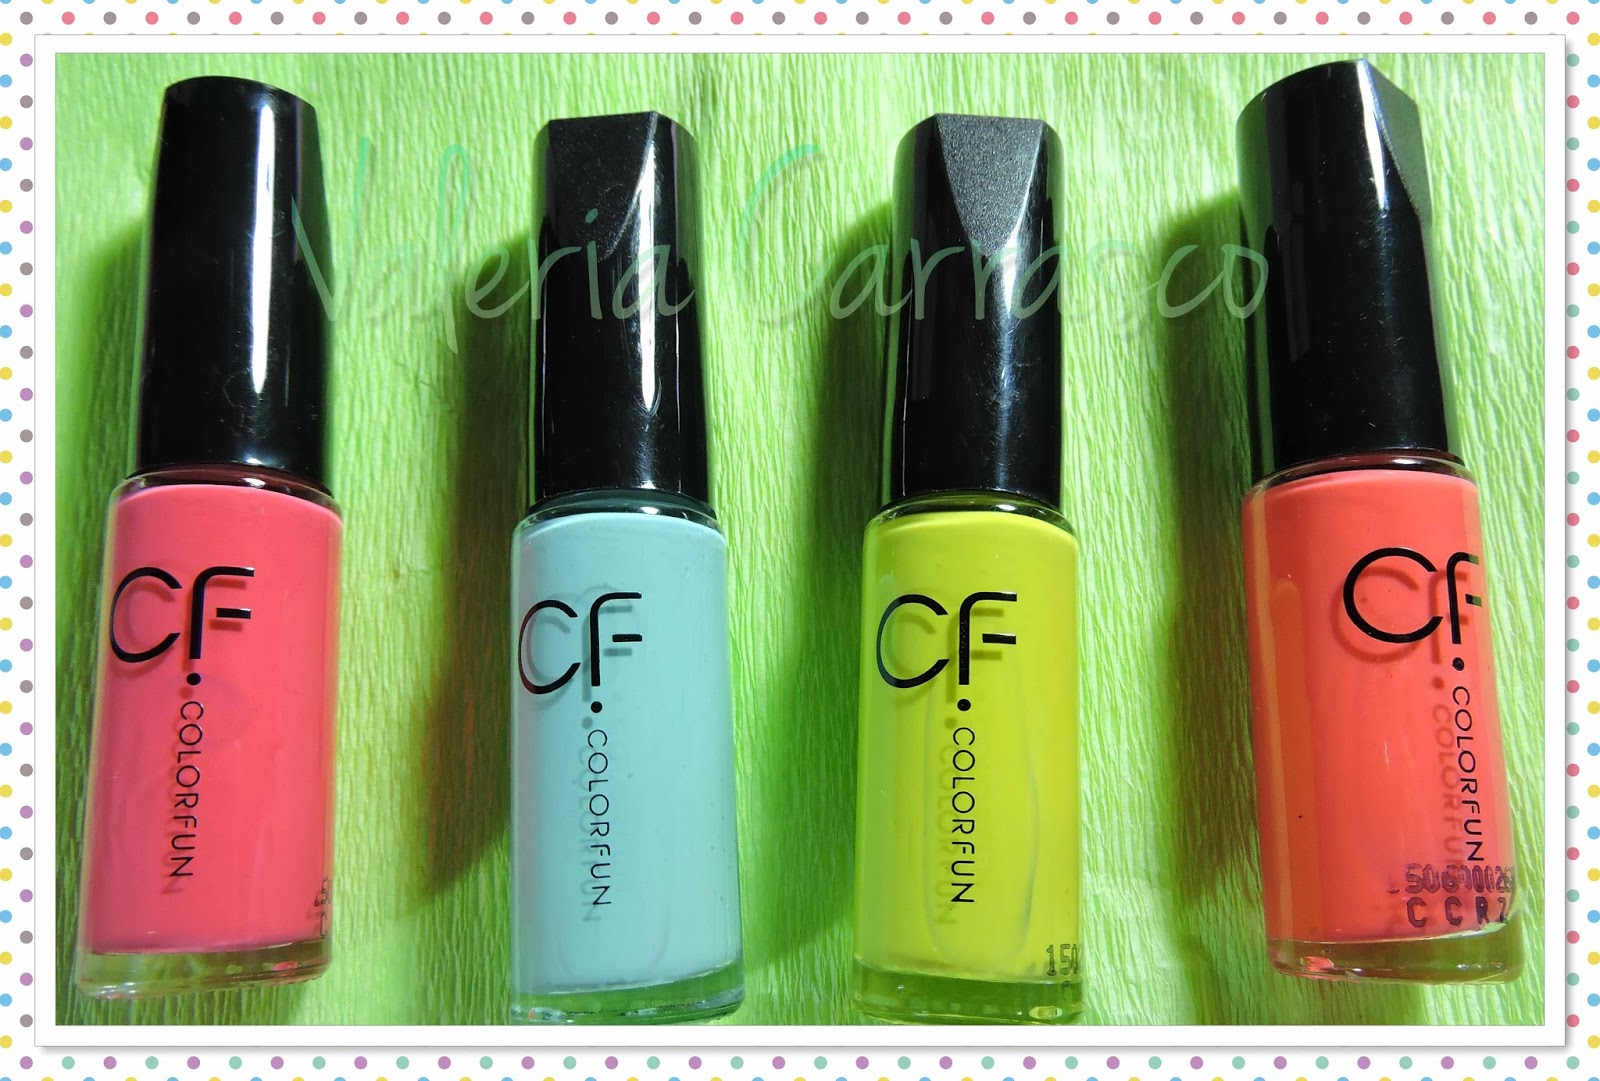 Esmaltes Color Fun ♡ | Valeria Carrasco